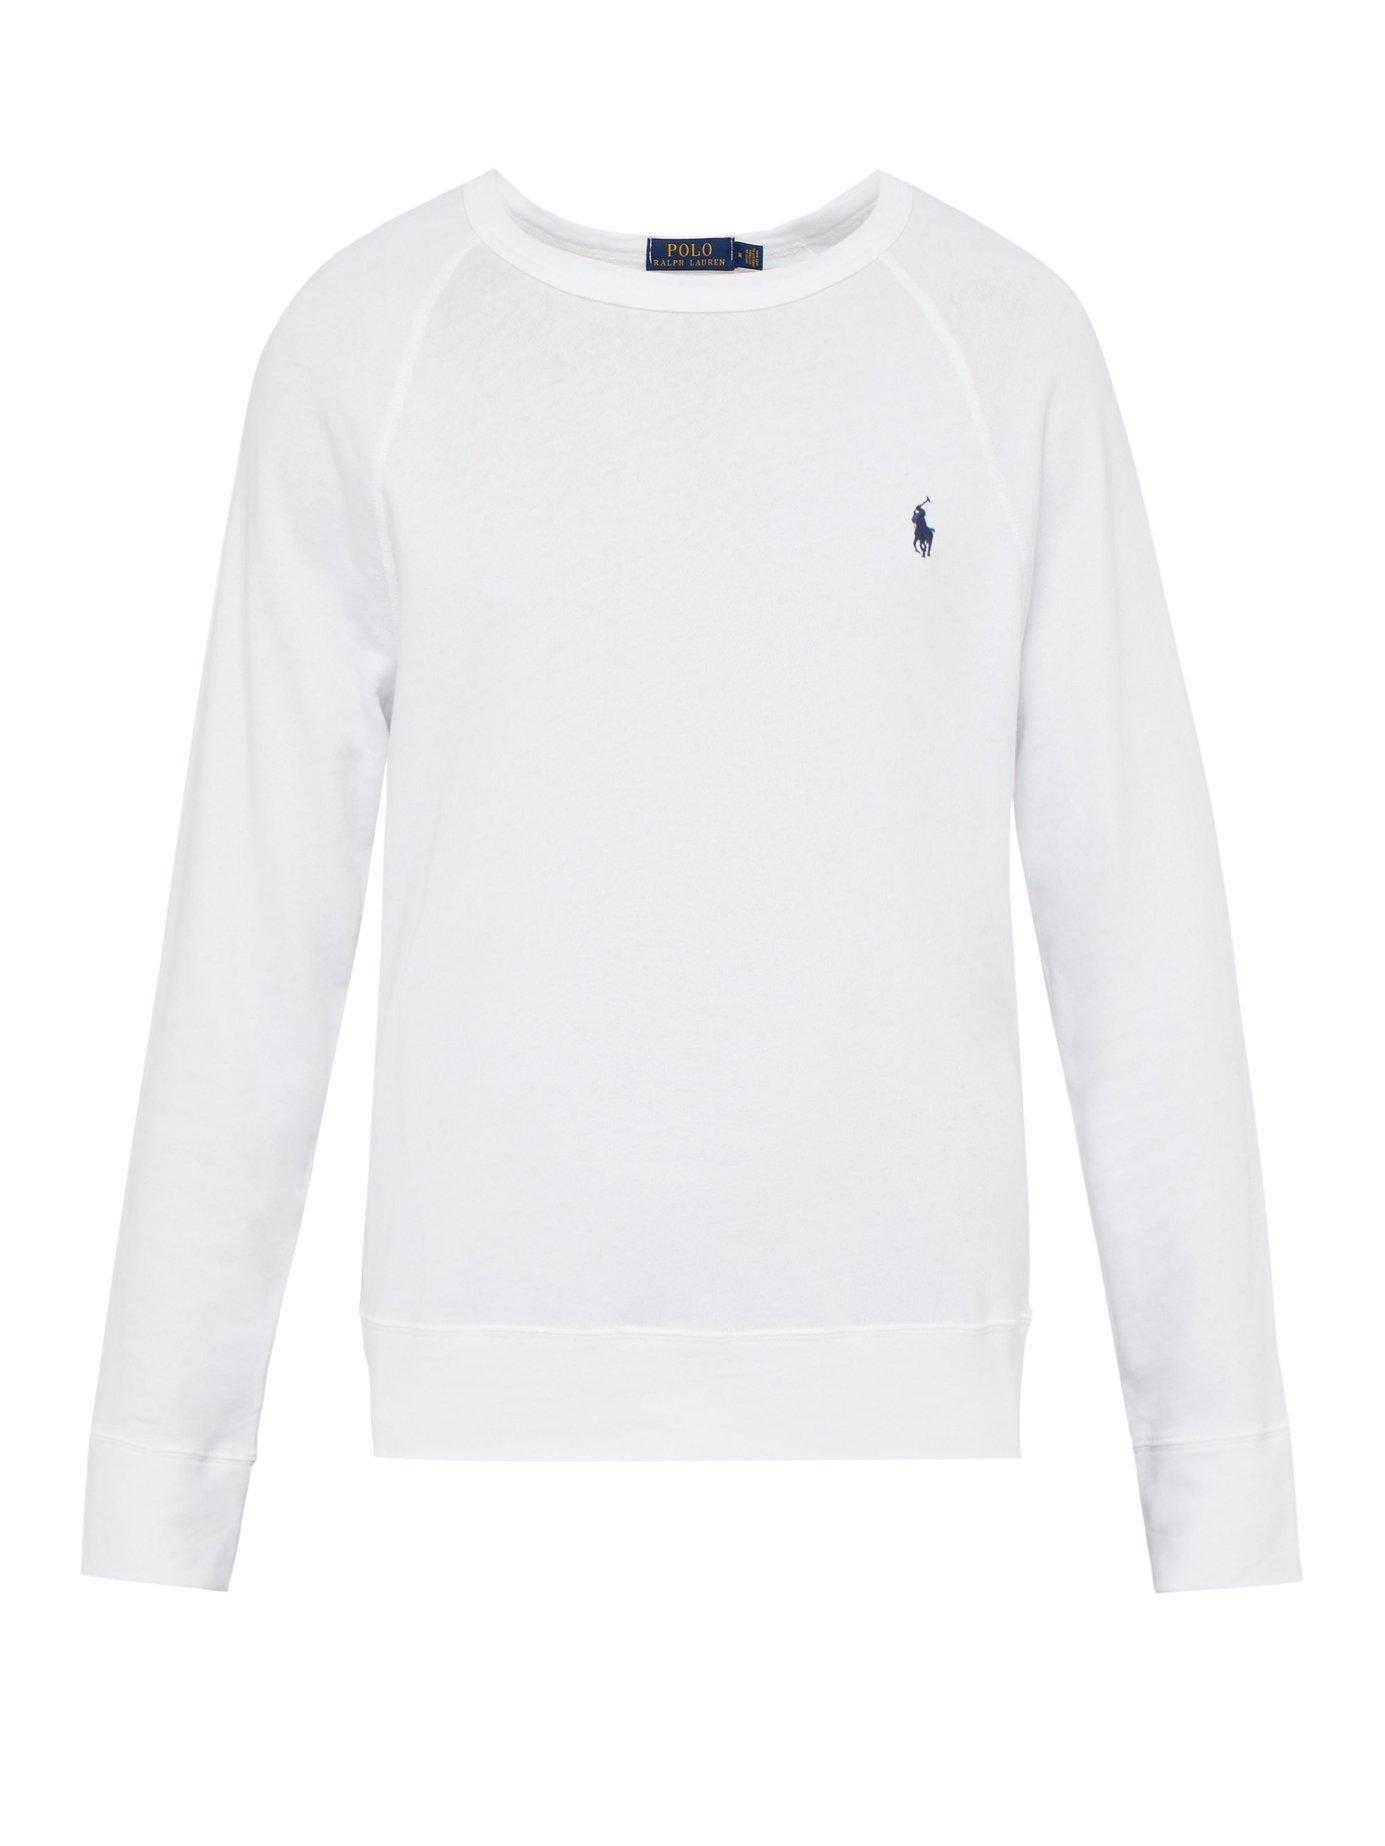 c7cebfc7edb9 Polo Ralph Lauren. Men s White Logo Embroidered Cotton Jersey Sweatshirt